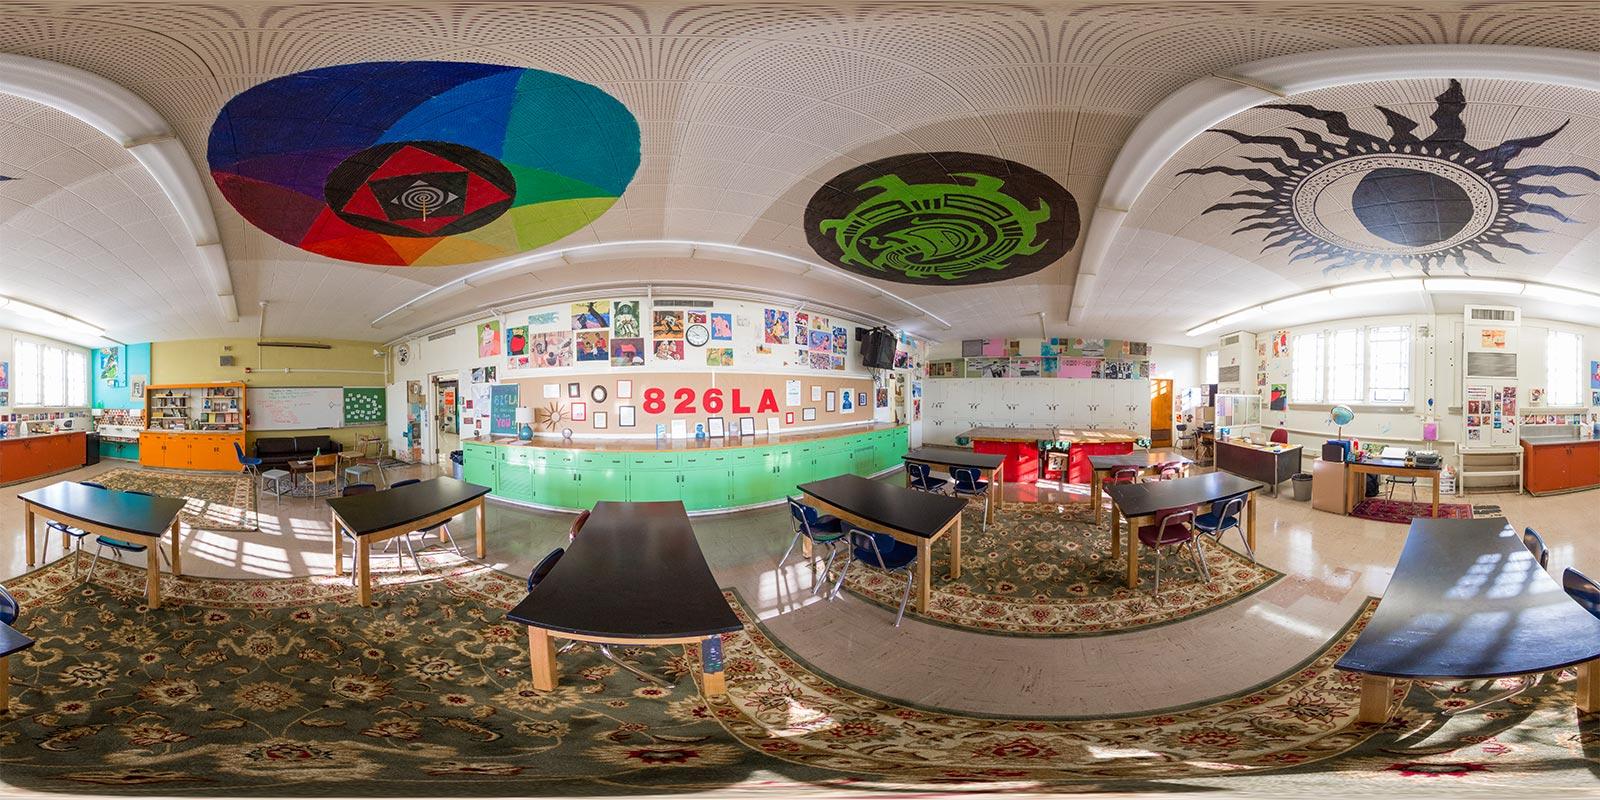 826LA Writers' Room at Manual Arts High School in Los Angeles